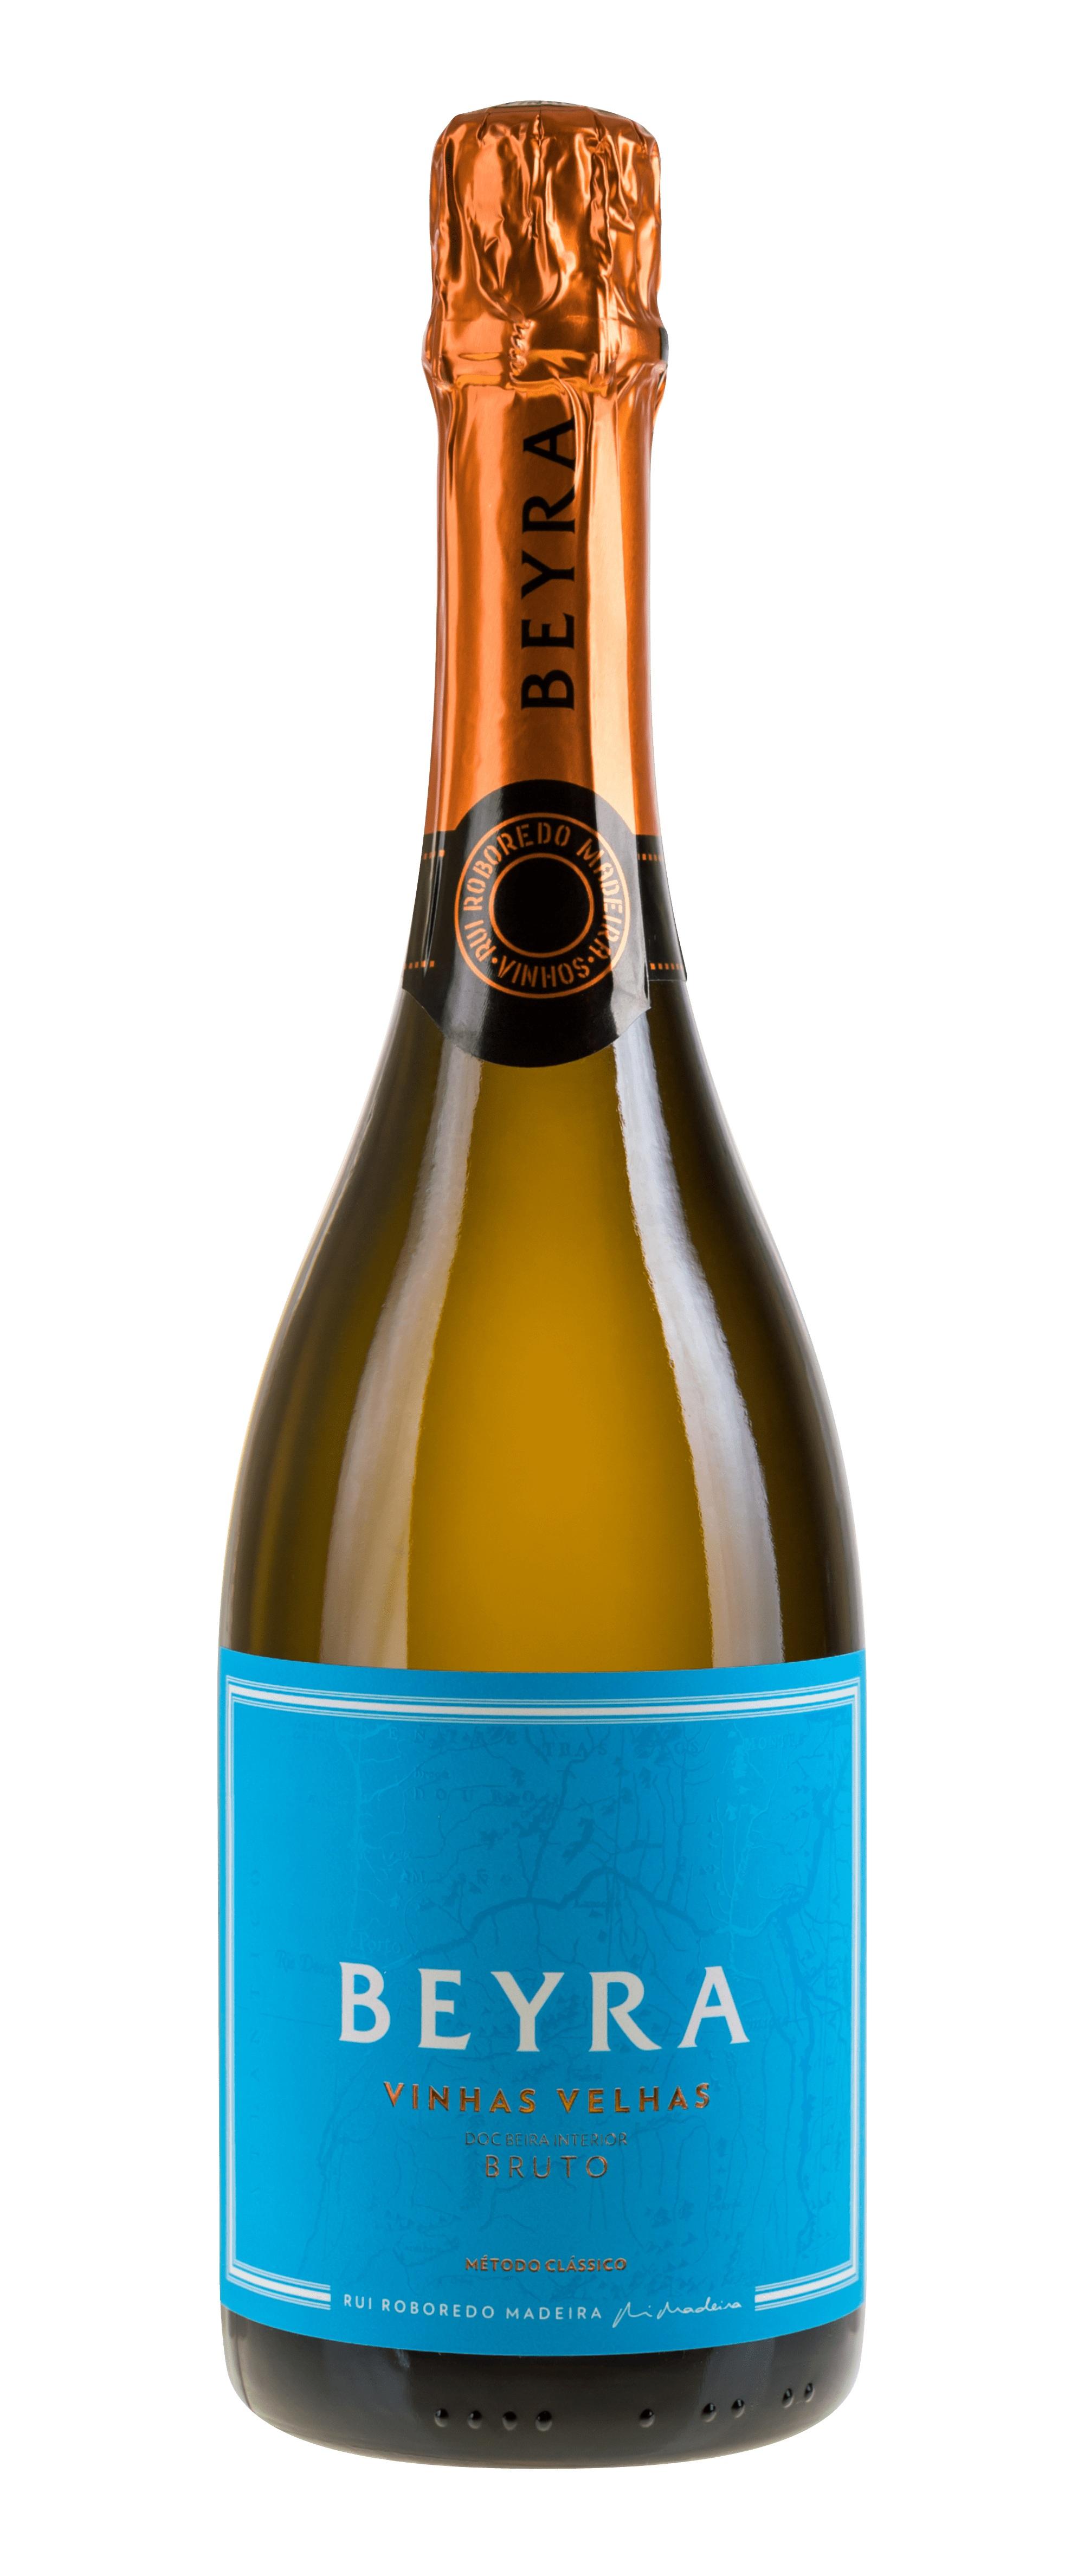 beyra+-+espumante+vinhas+velhas+branco+NV_ss-min.jpg